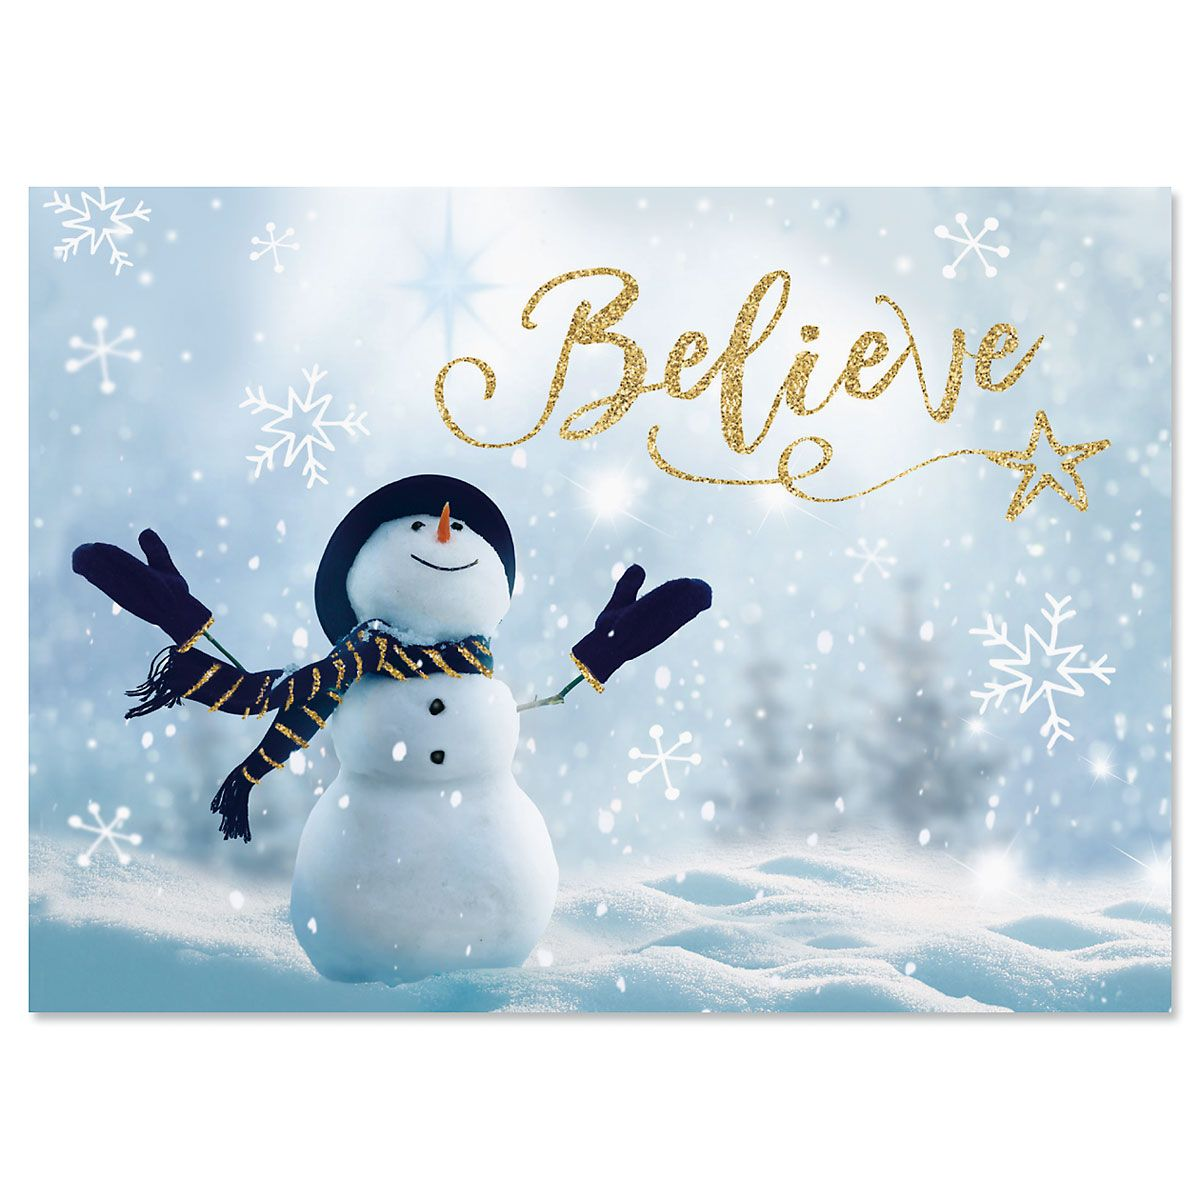 Believe Snowman Christmas Cards Current Catalog